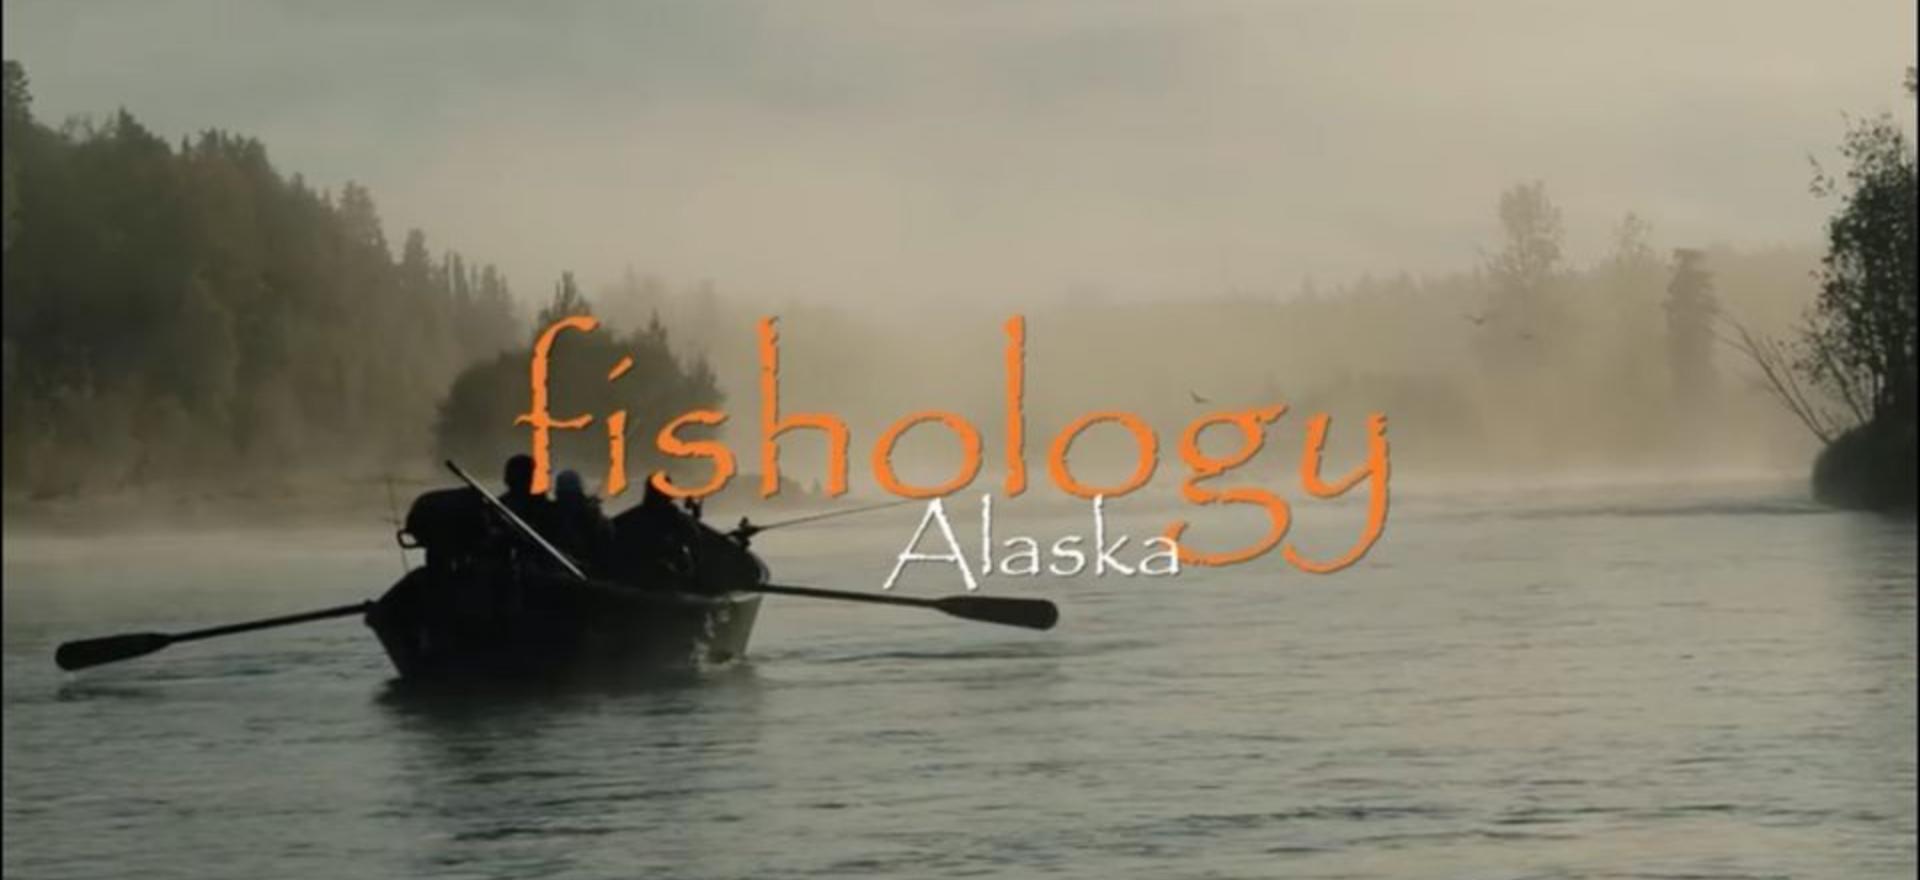 Fishology Alaska